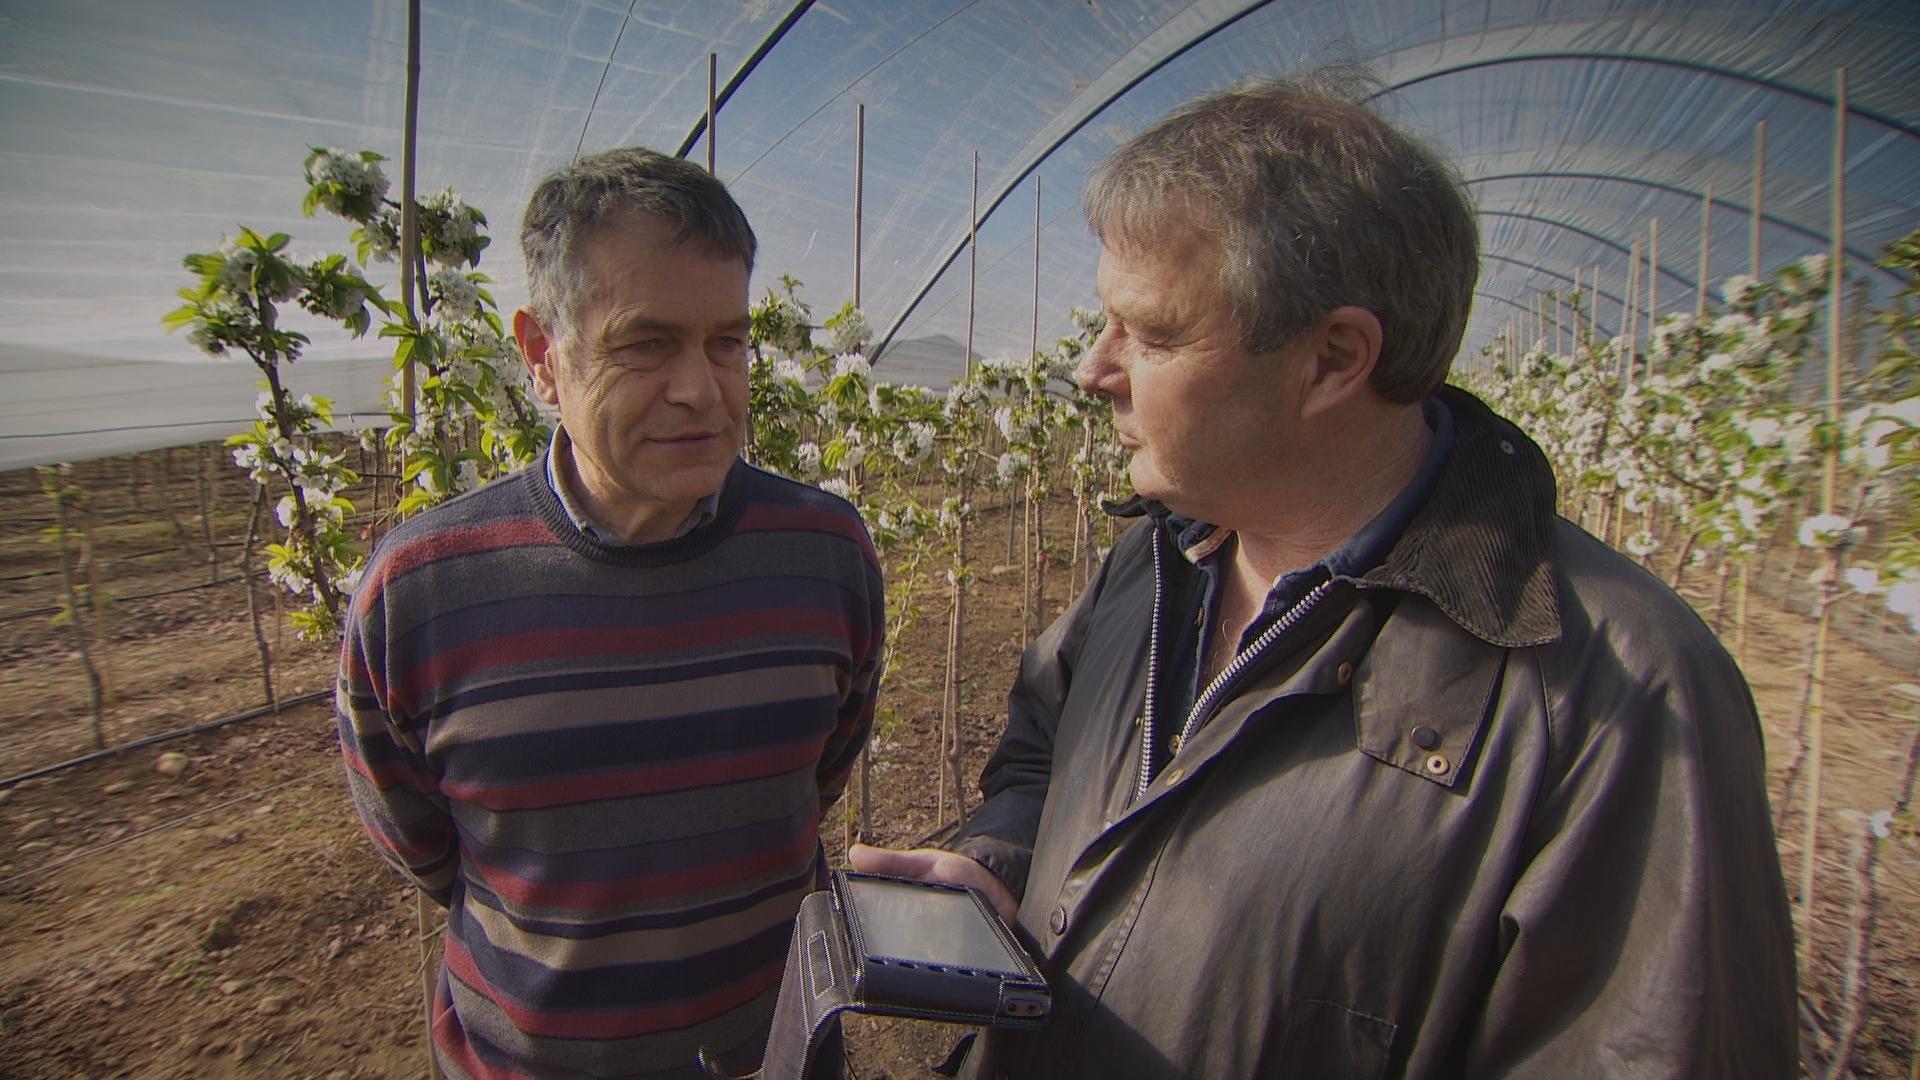 Farmer Peter Thomson, left, interviewed by Landward presenter Euan McIlwraith.